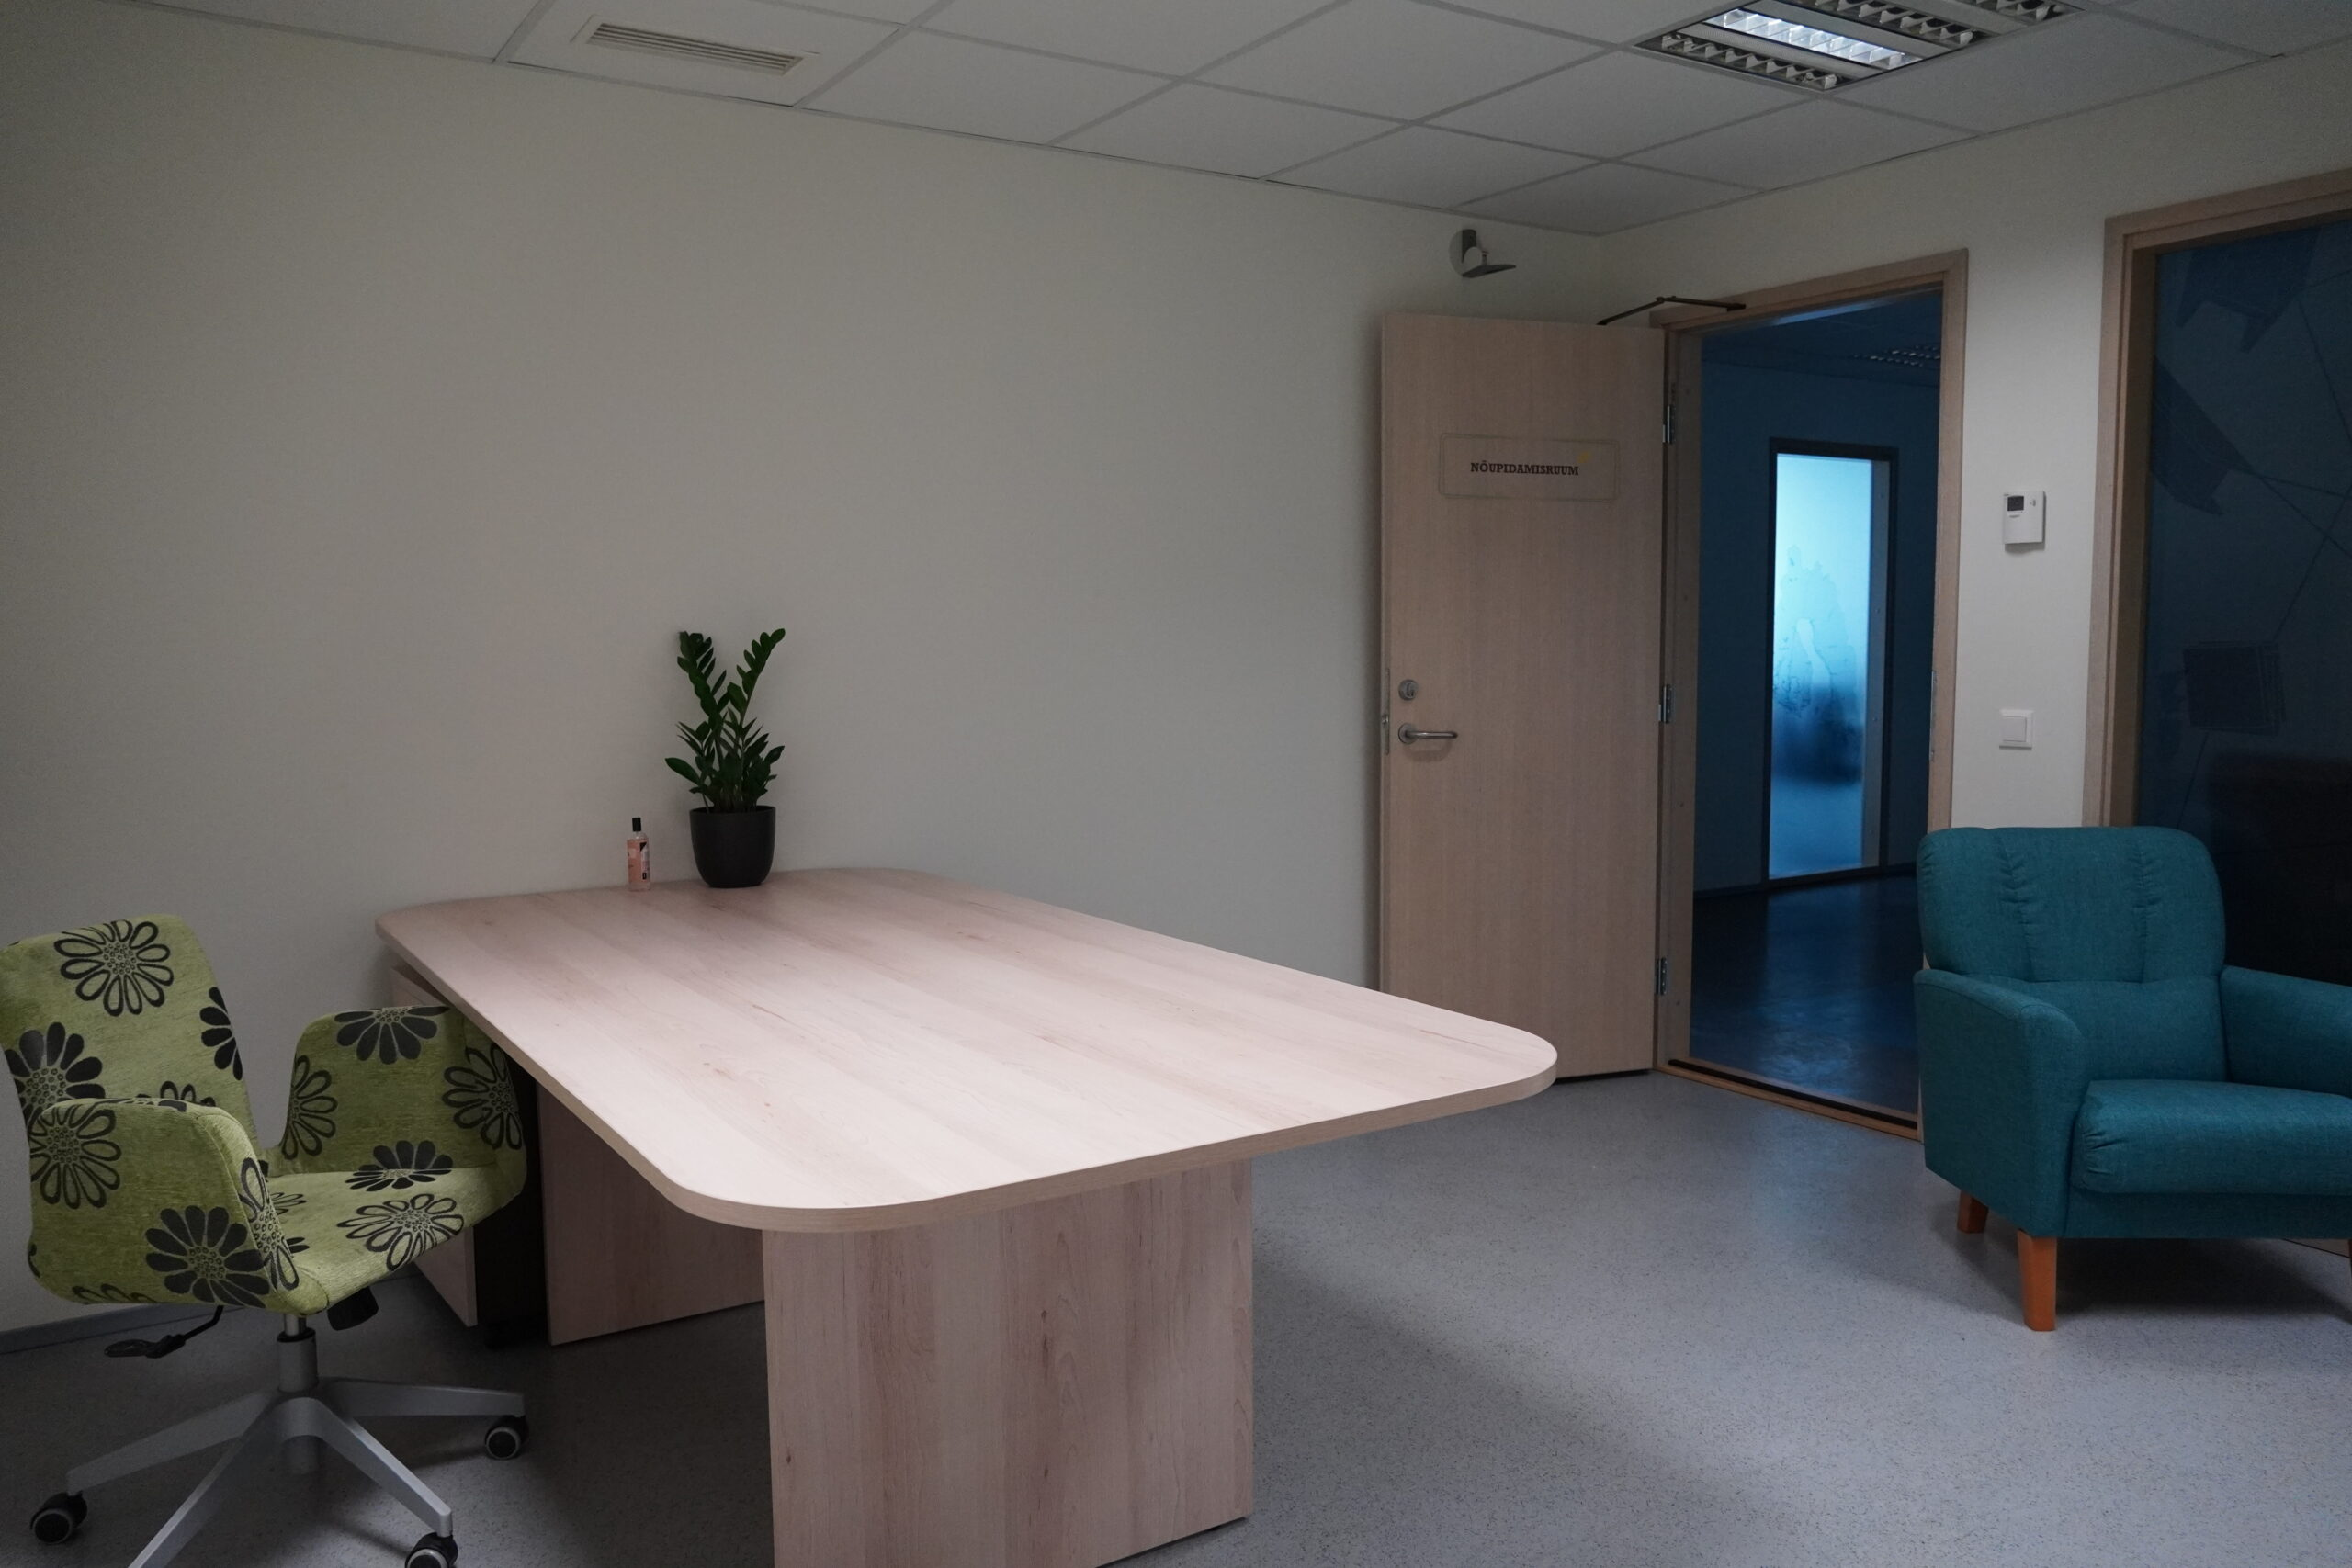 Hubane kontoriruum Tallinnas